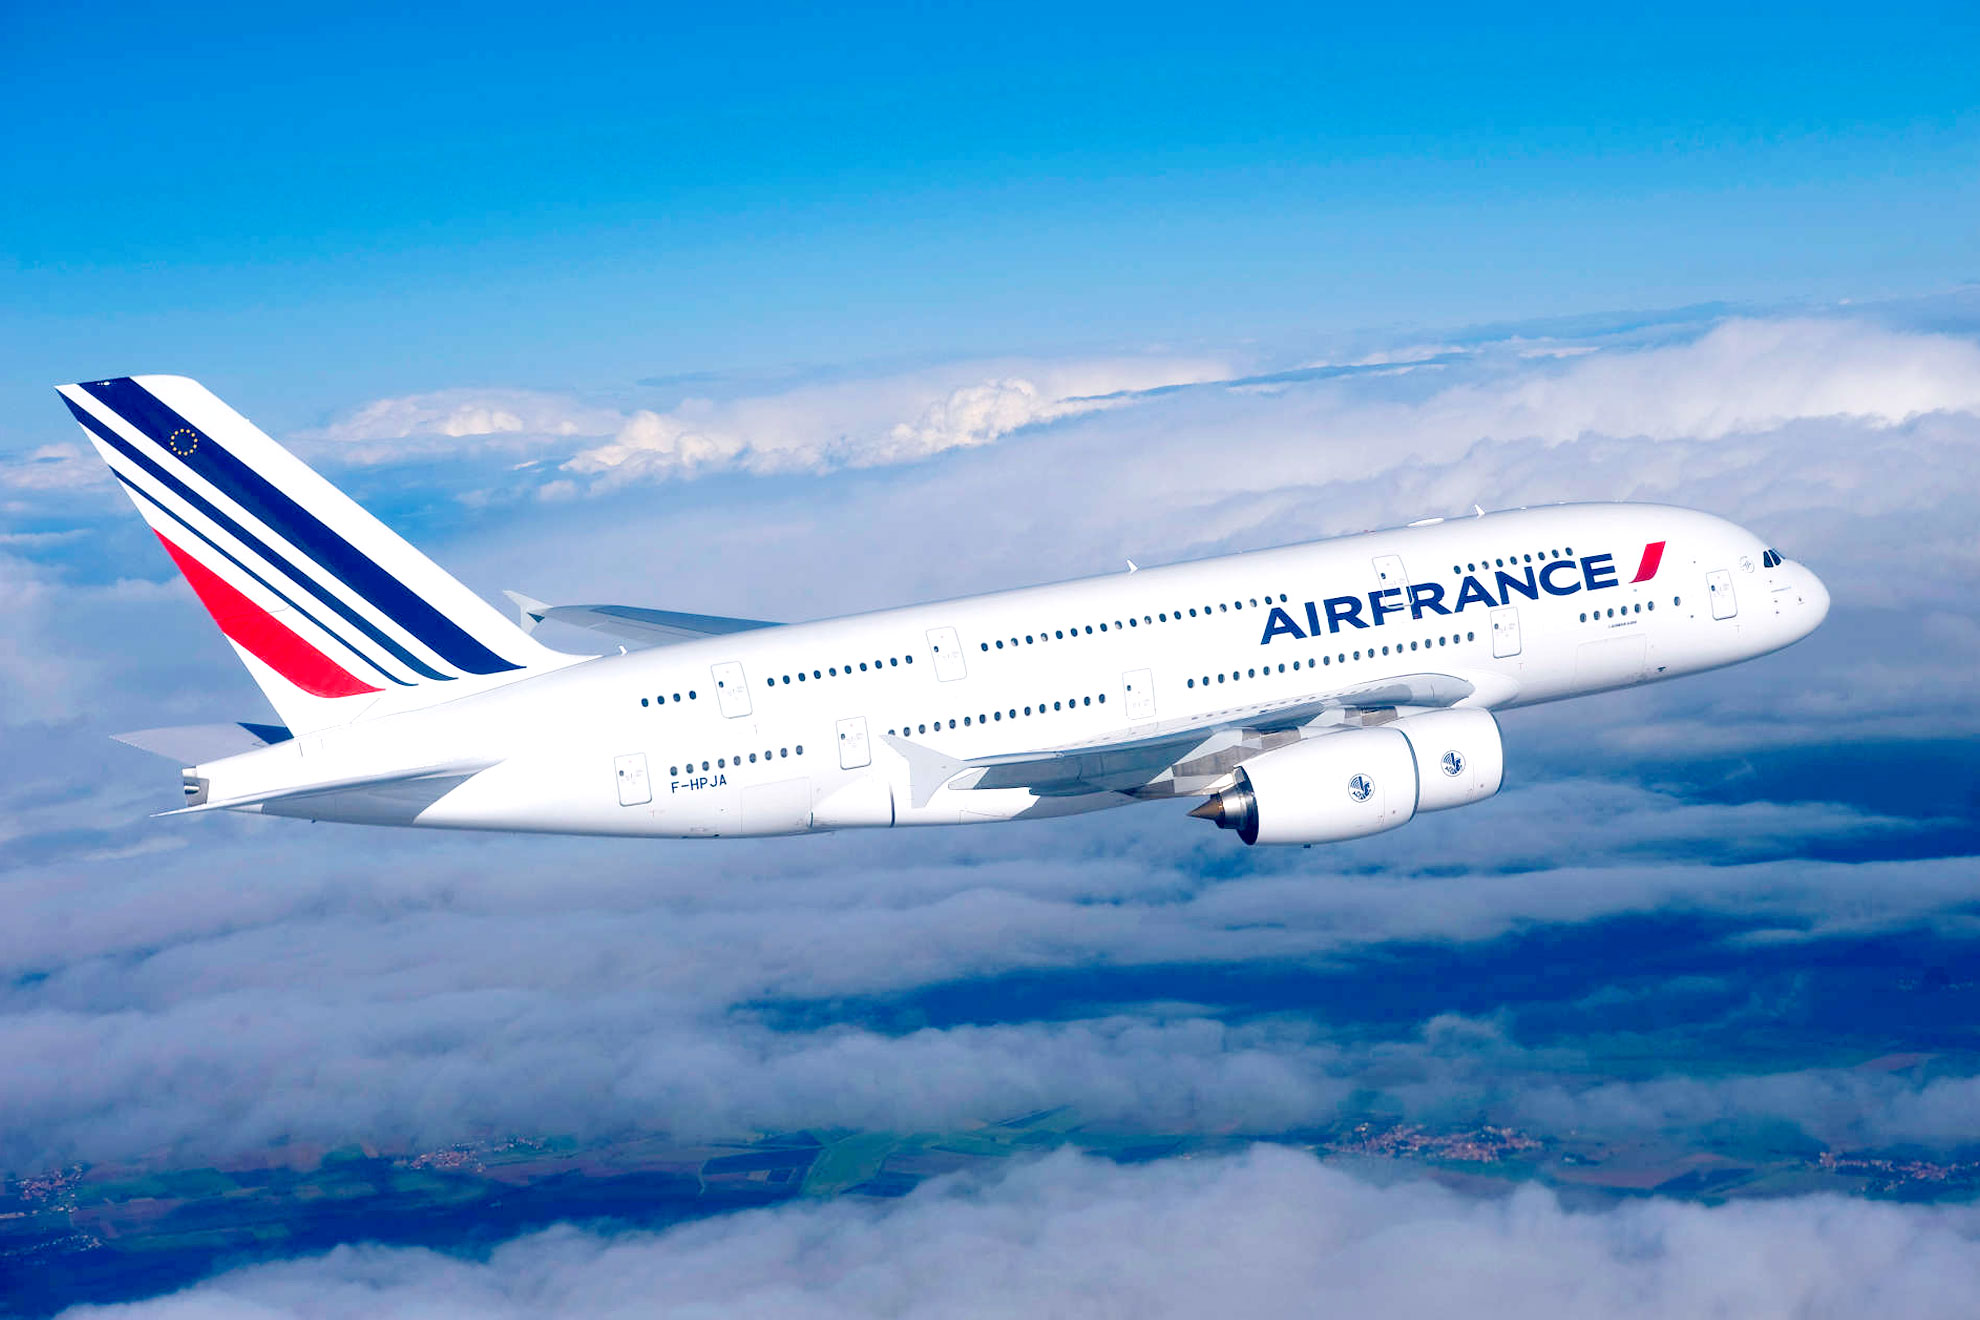 Air France resumes flights to Pakistan